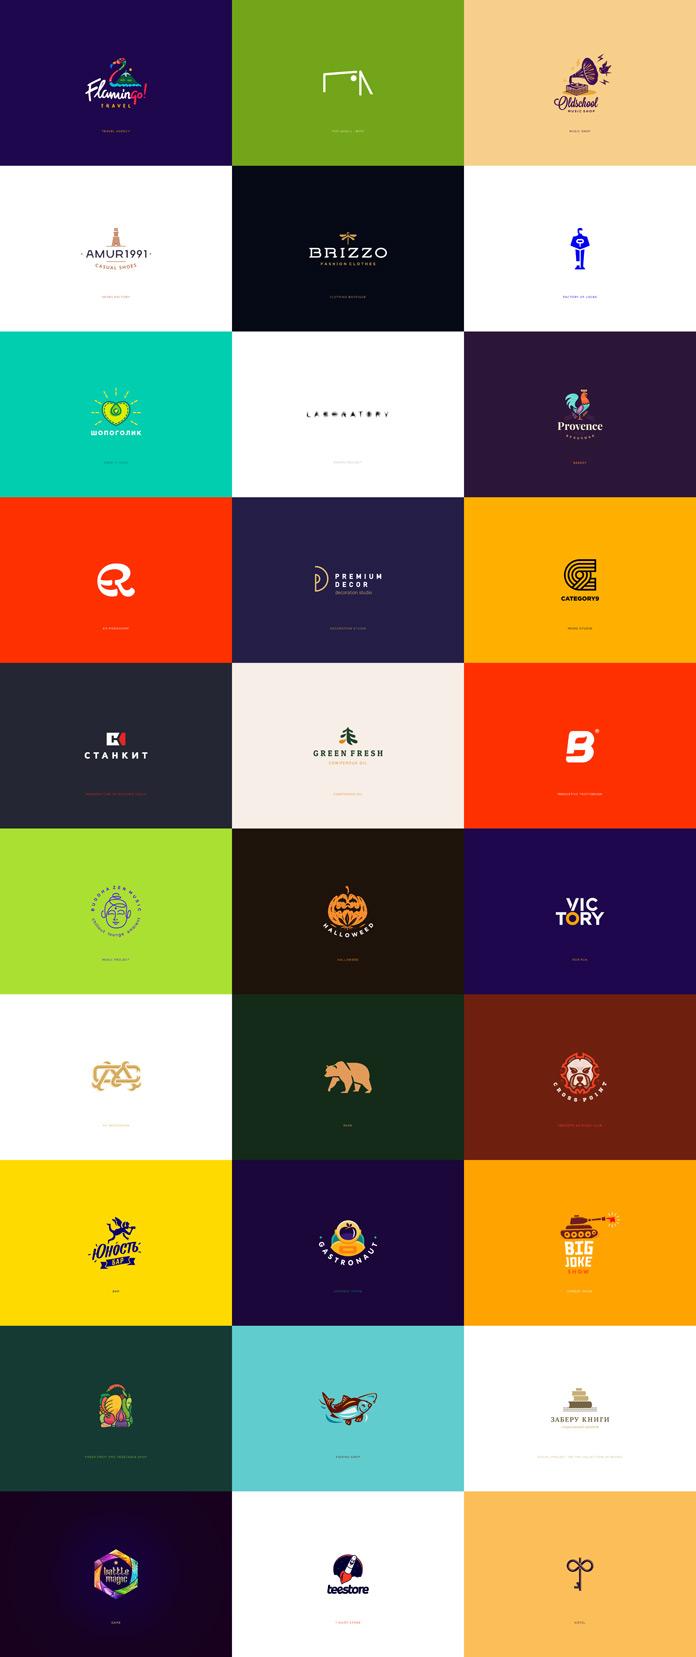 30 Logos and Marks by Graphic Designer Ilya Shapko